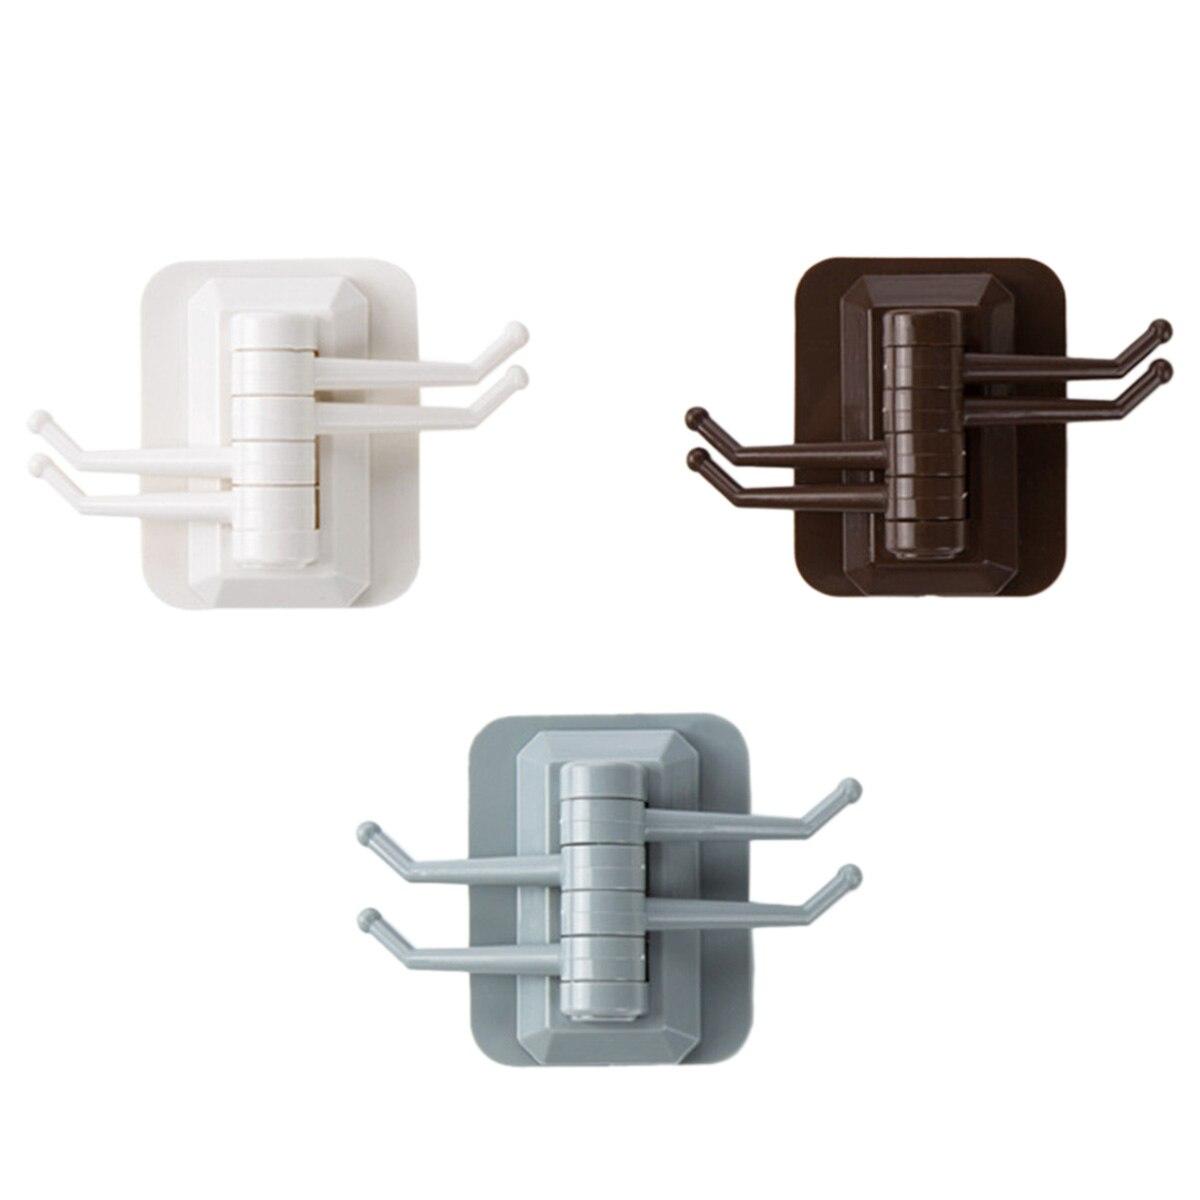 Creative Rotatable Wall Hook Self Adhesive Towel Rack Key Bag Hanger Kitchen Bathroom Storage Hanging Holder Rack